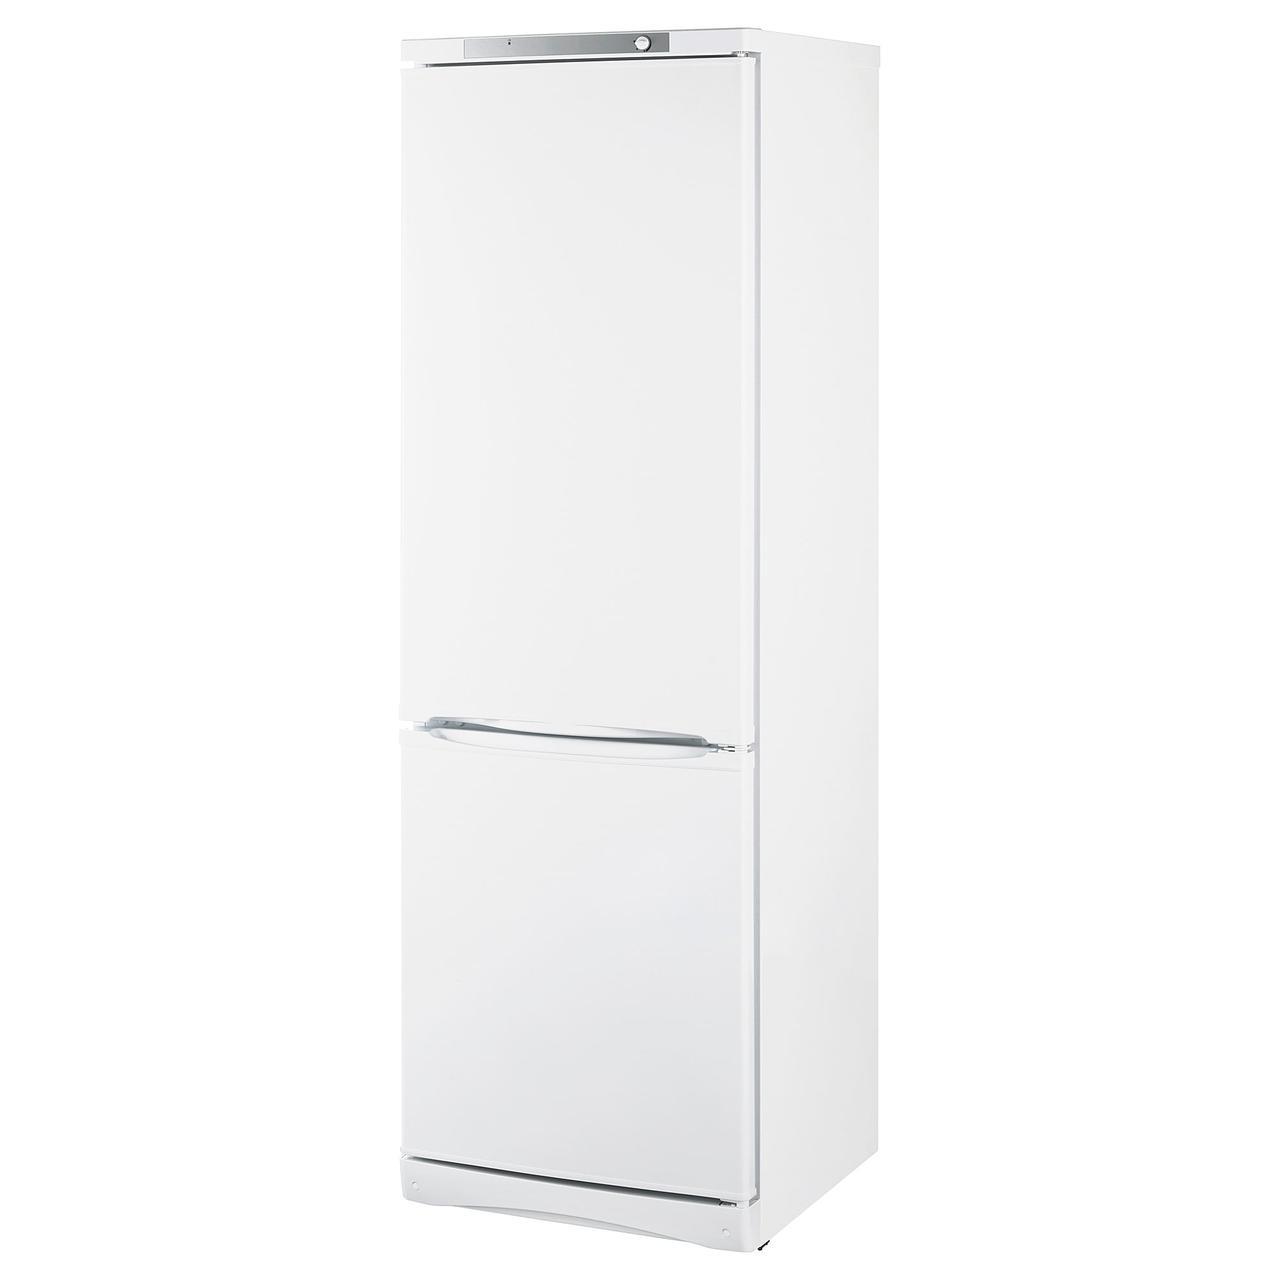 НЕДИСАД Холодильник/ морозильник, белый